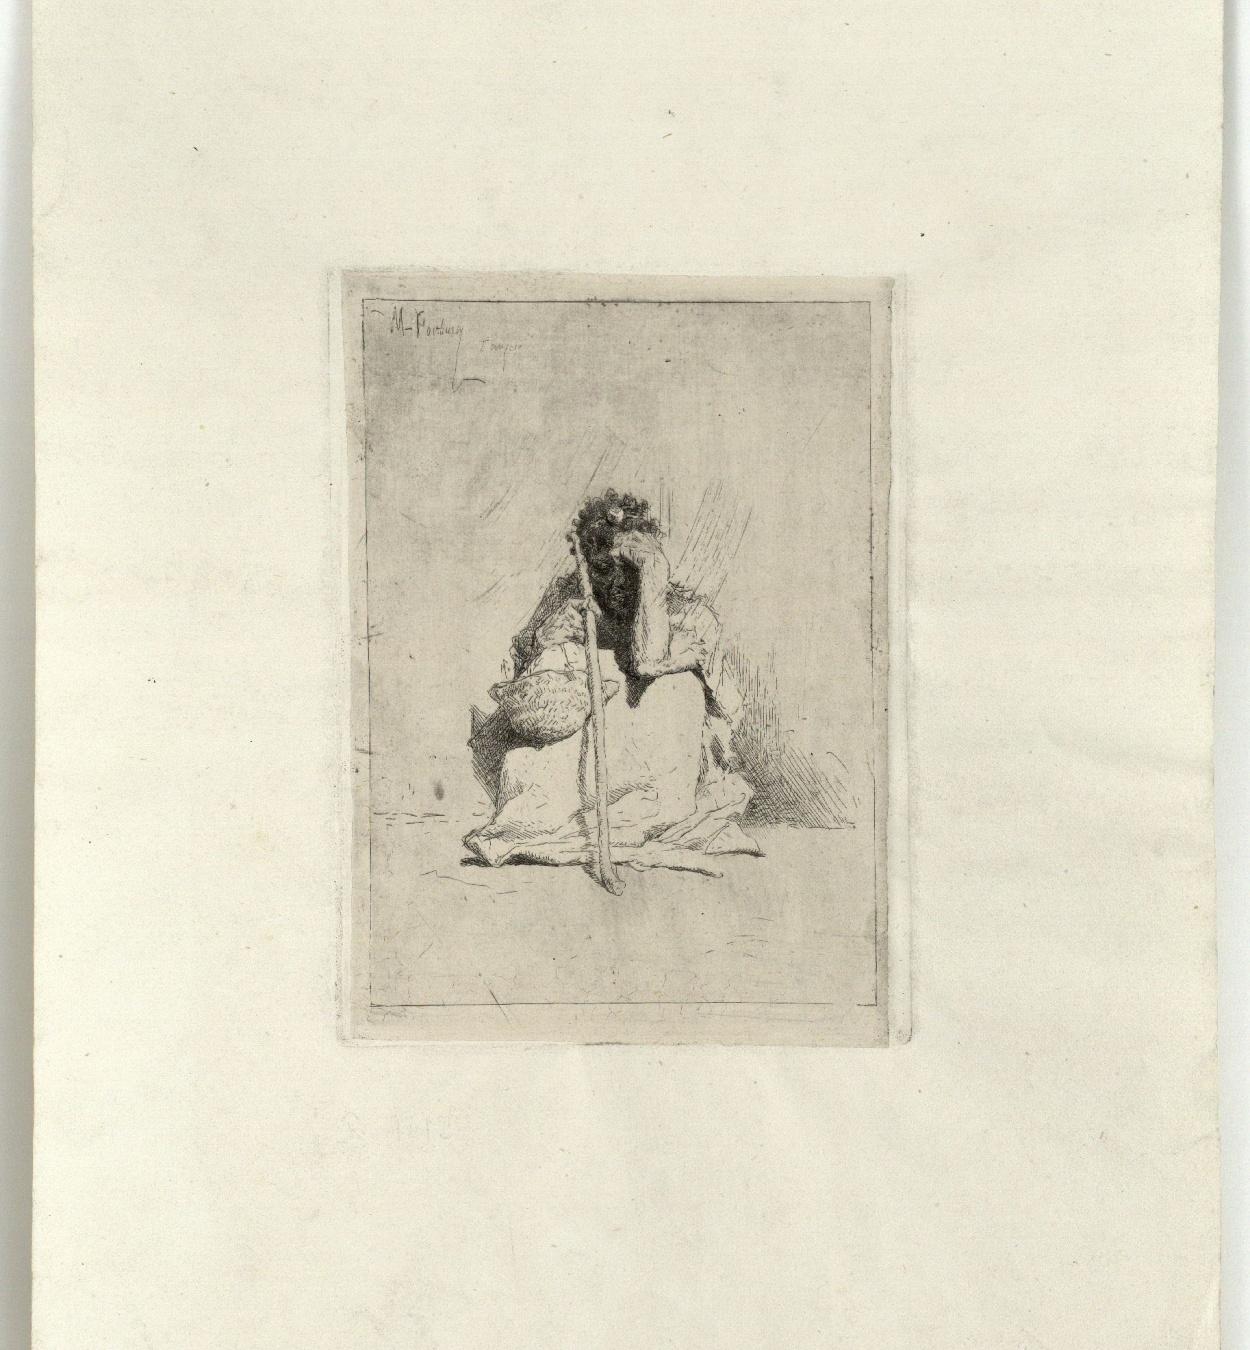 Marià Fortuny - Beggar - After 1862